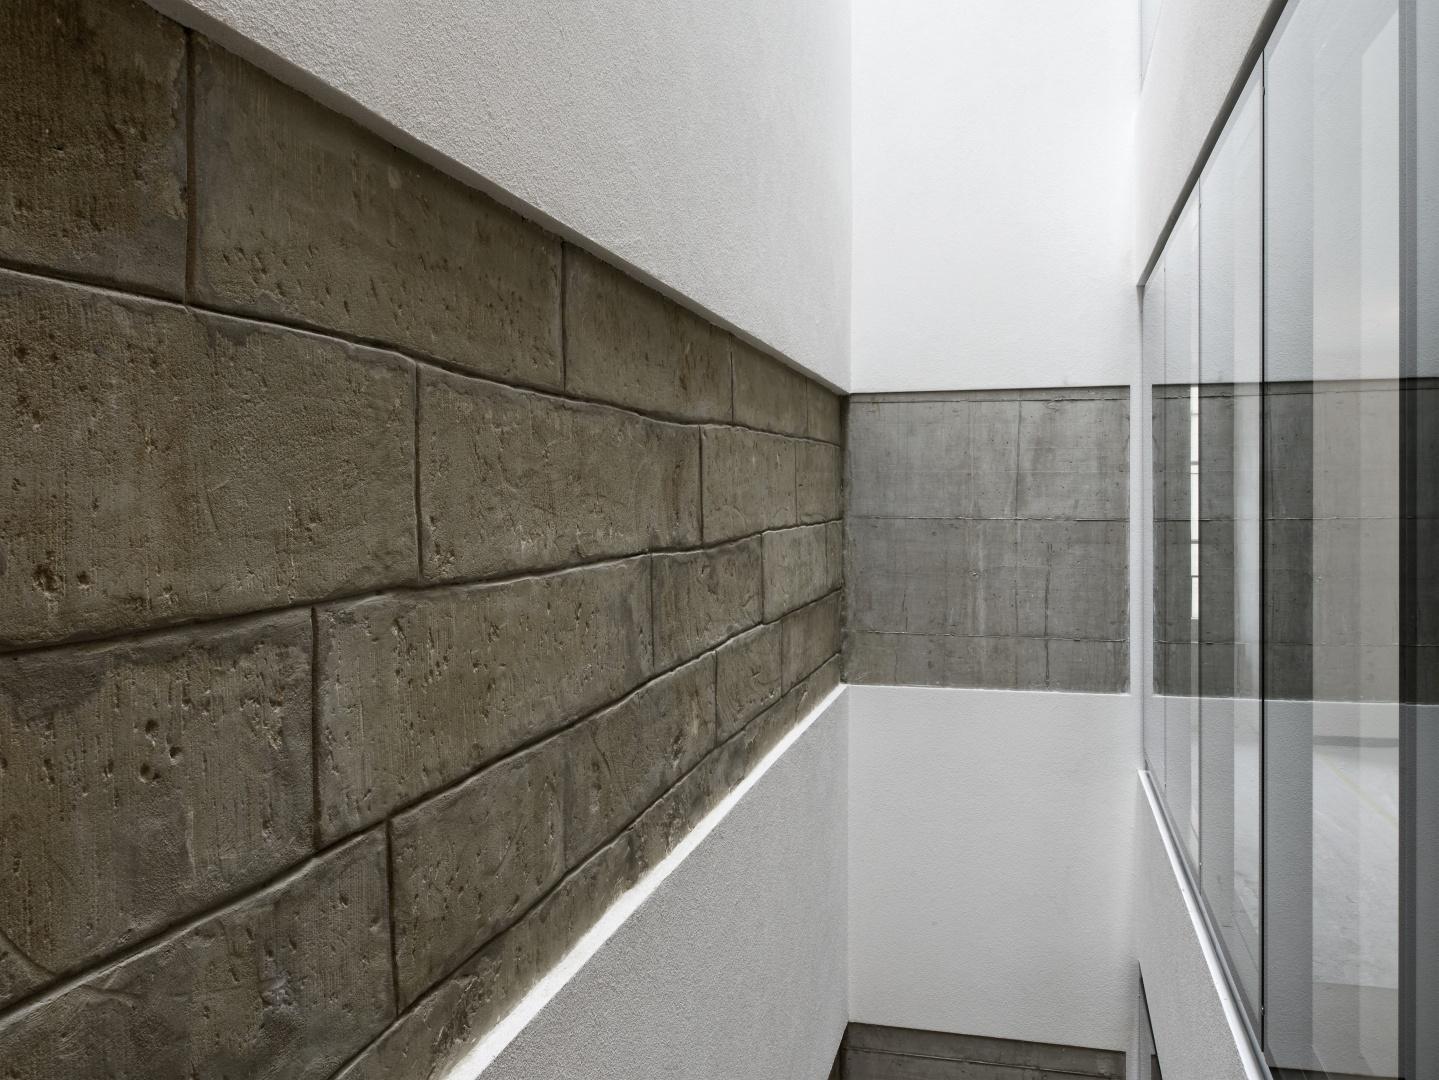 © Dunning architecture, Rue Jean-Jaquet 8, 1201 Genève